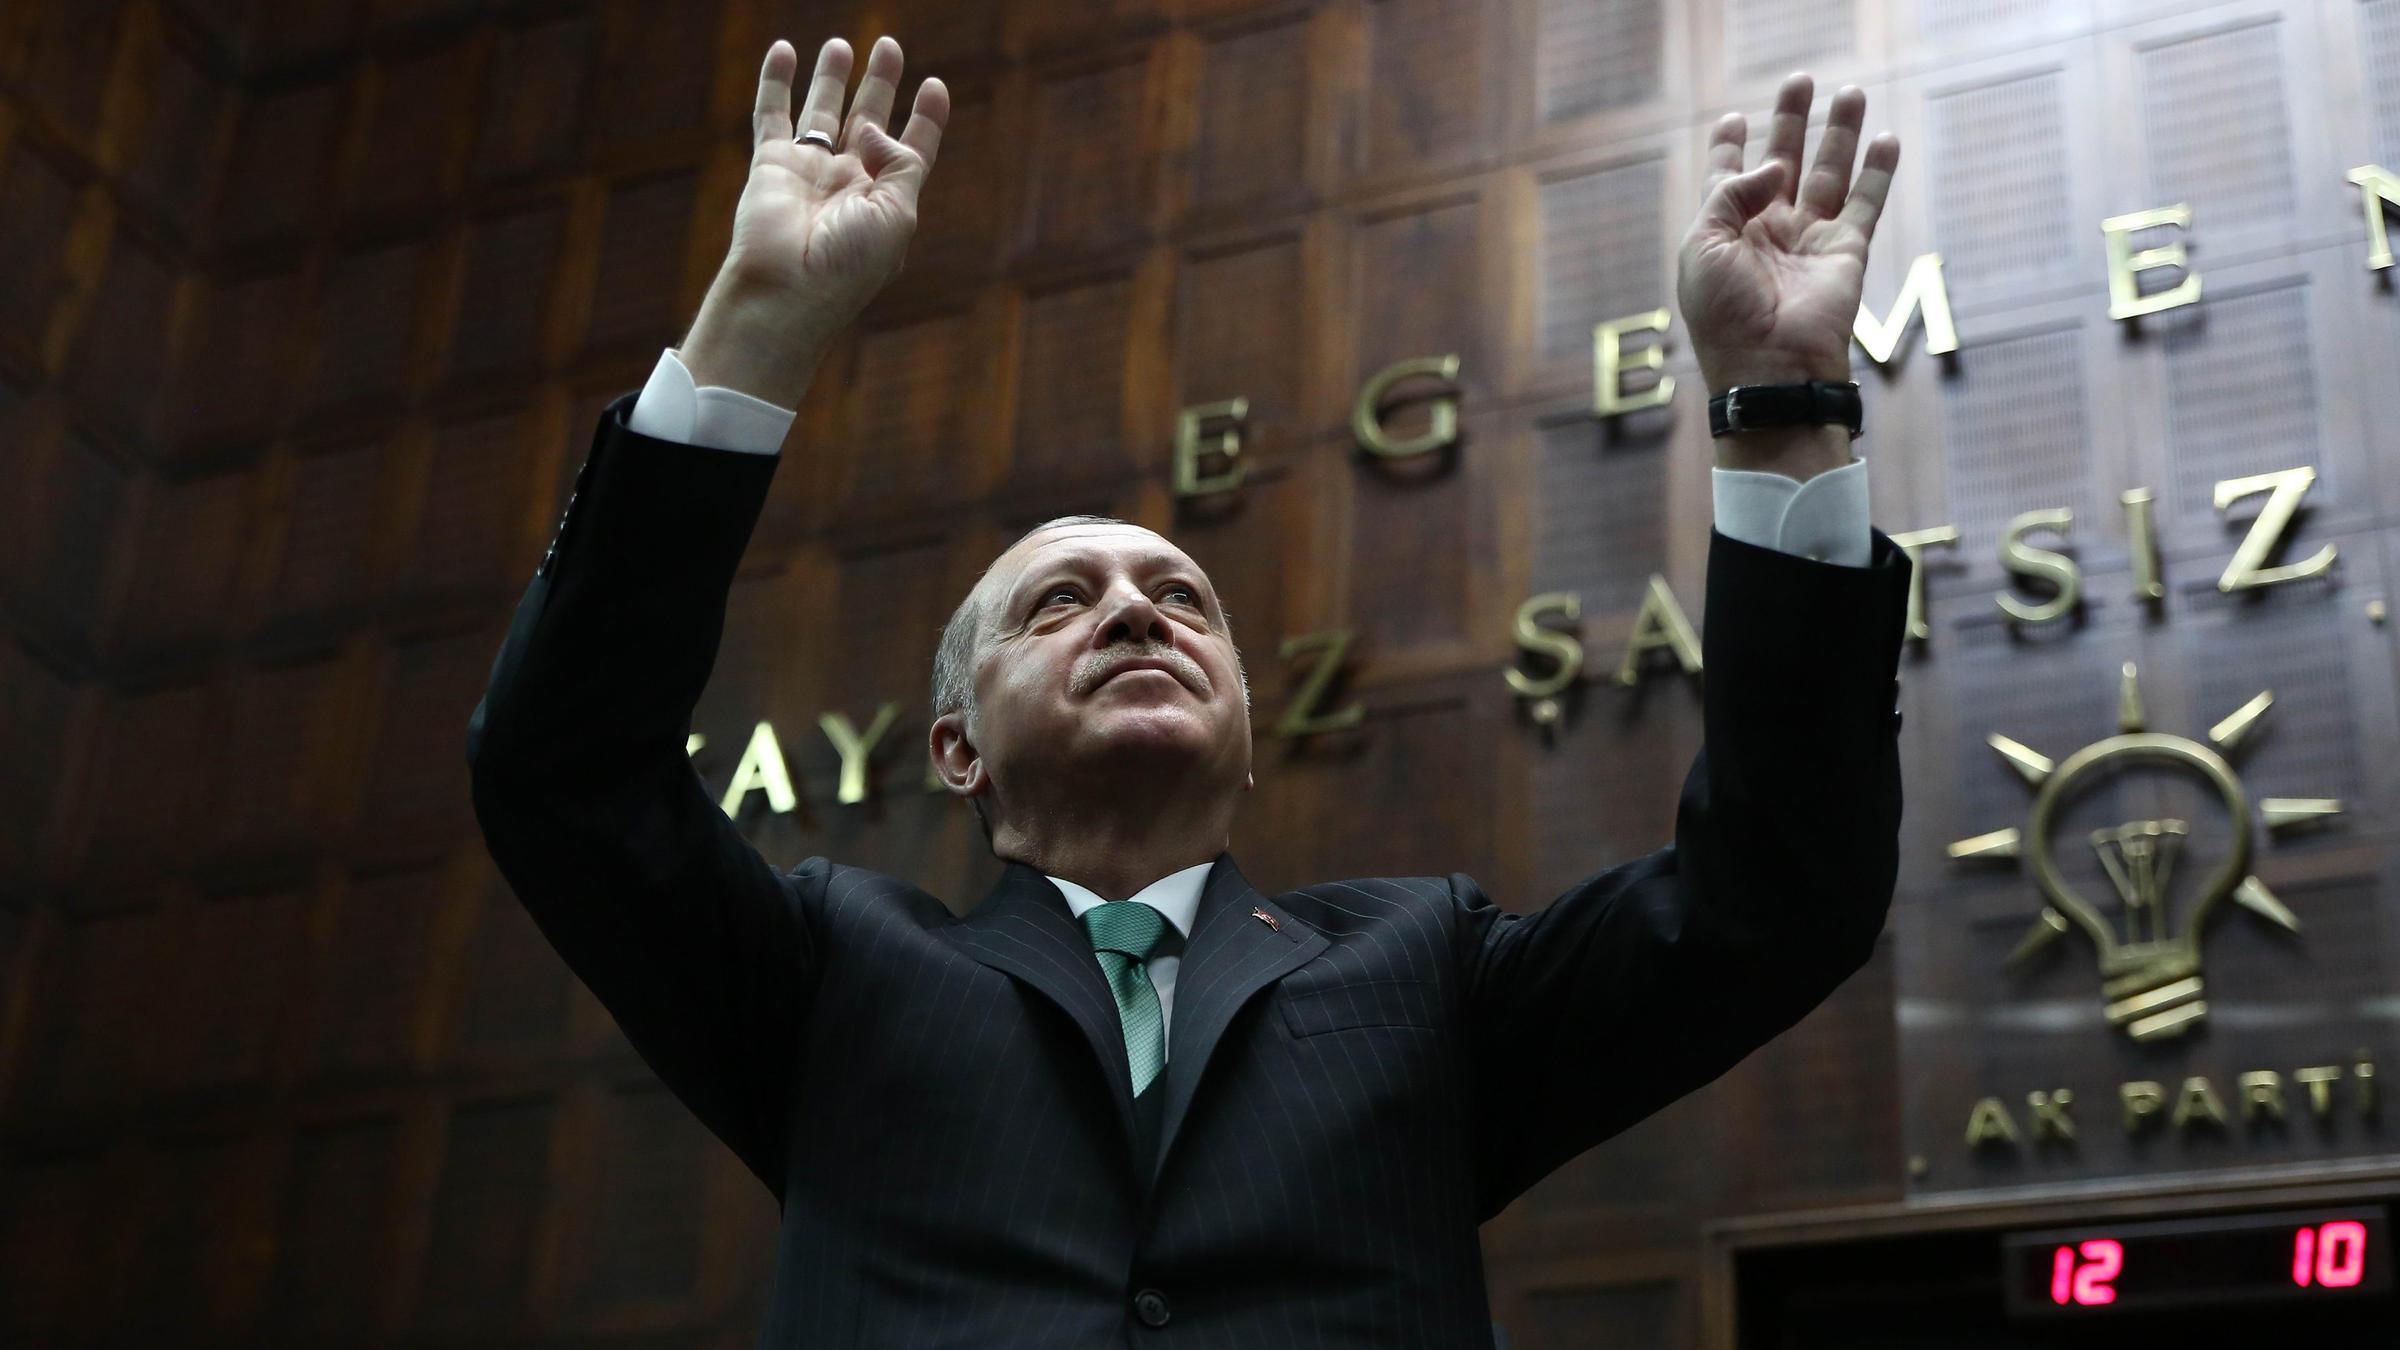 Turkey: President Erdogan calls snap election for June